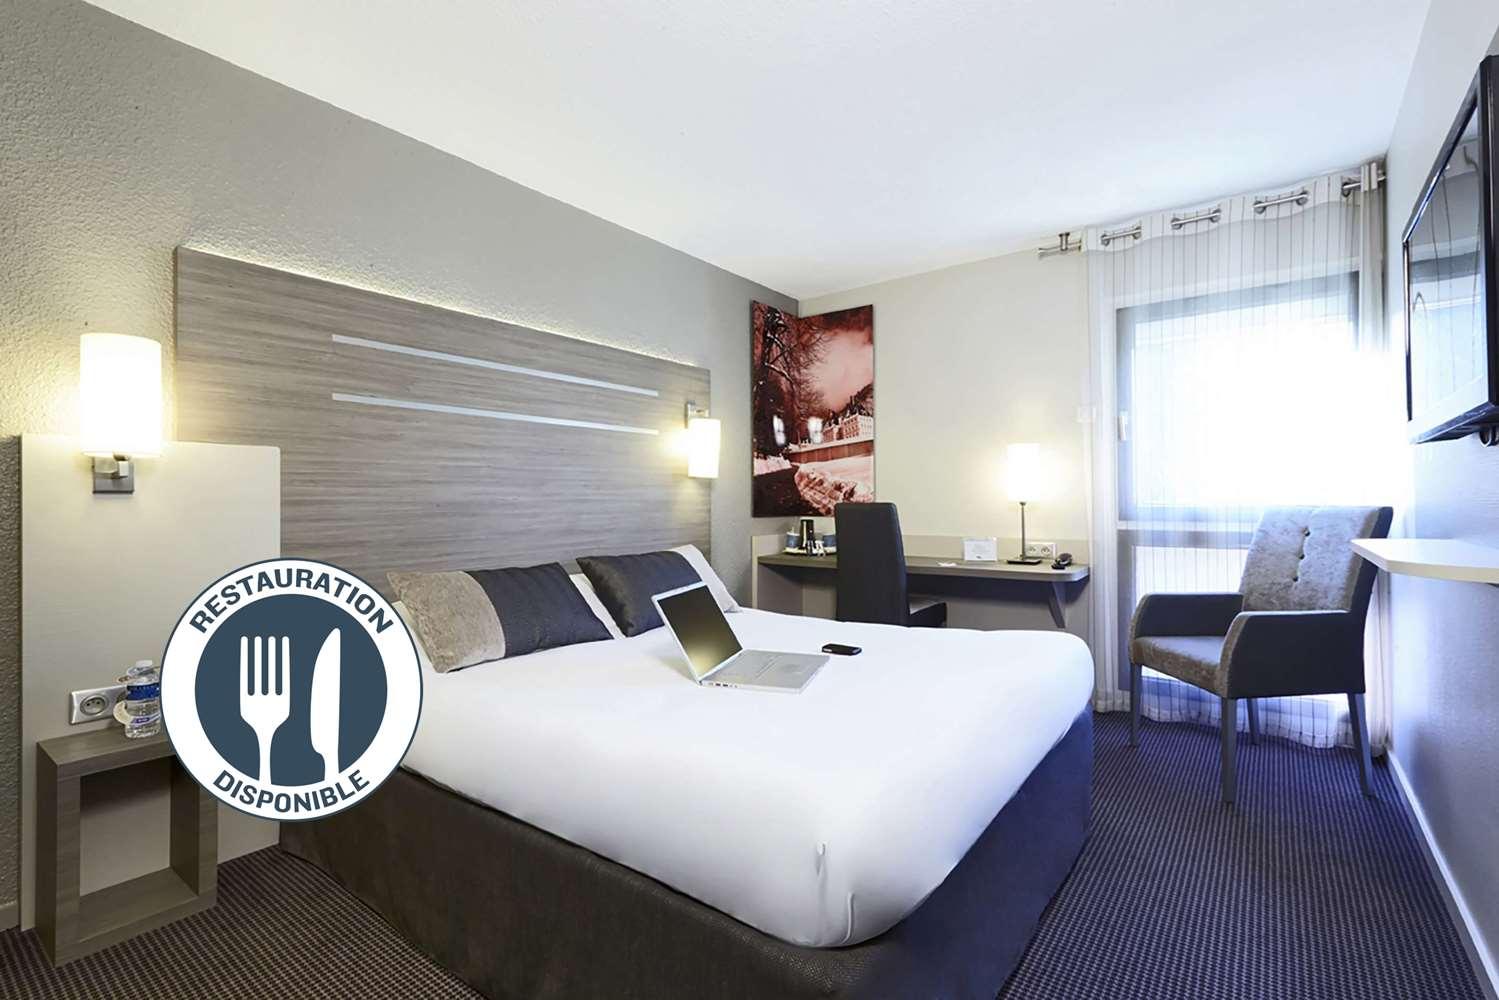 HOTEL KYRIAD VOIRON Chartreuse - Centr'Alp - Grenoble